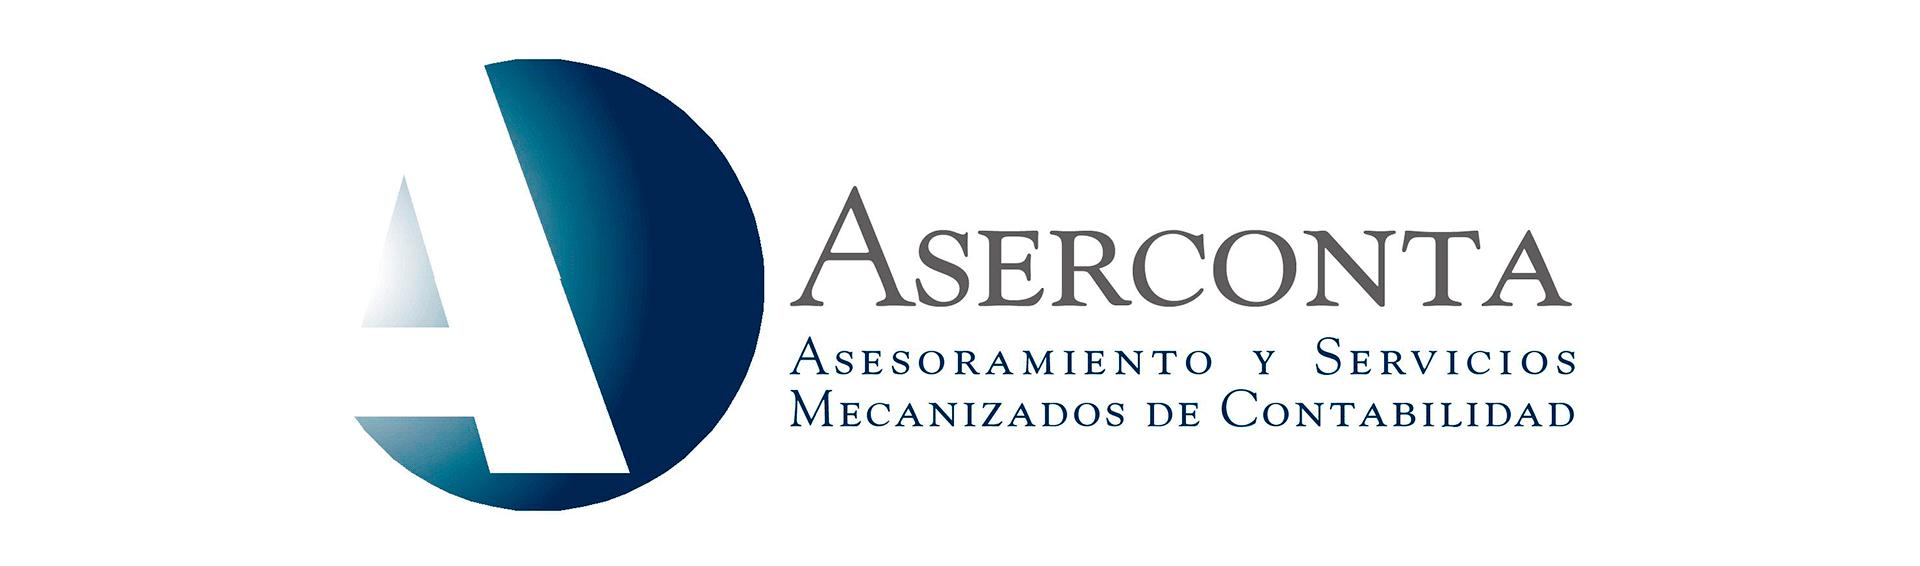 Aserconta